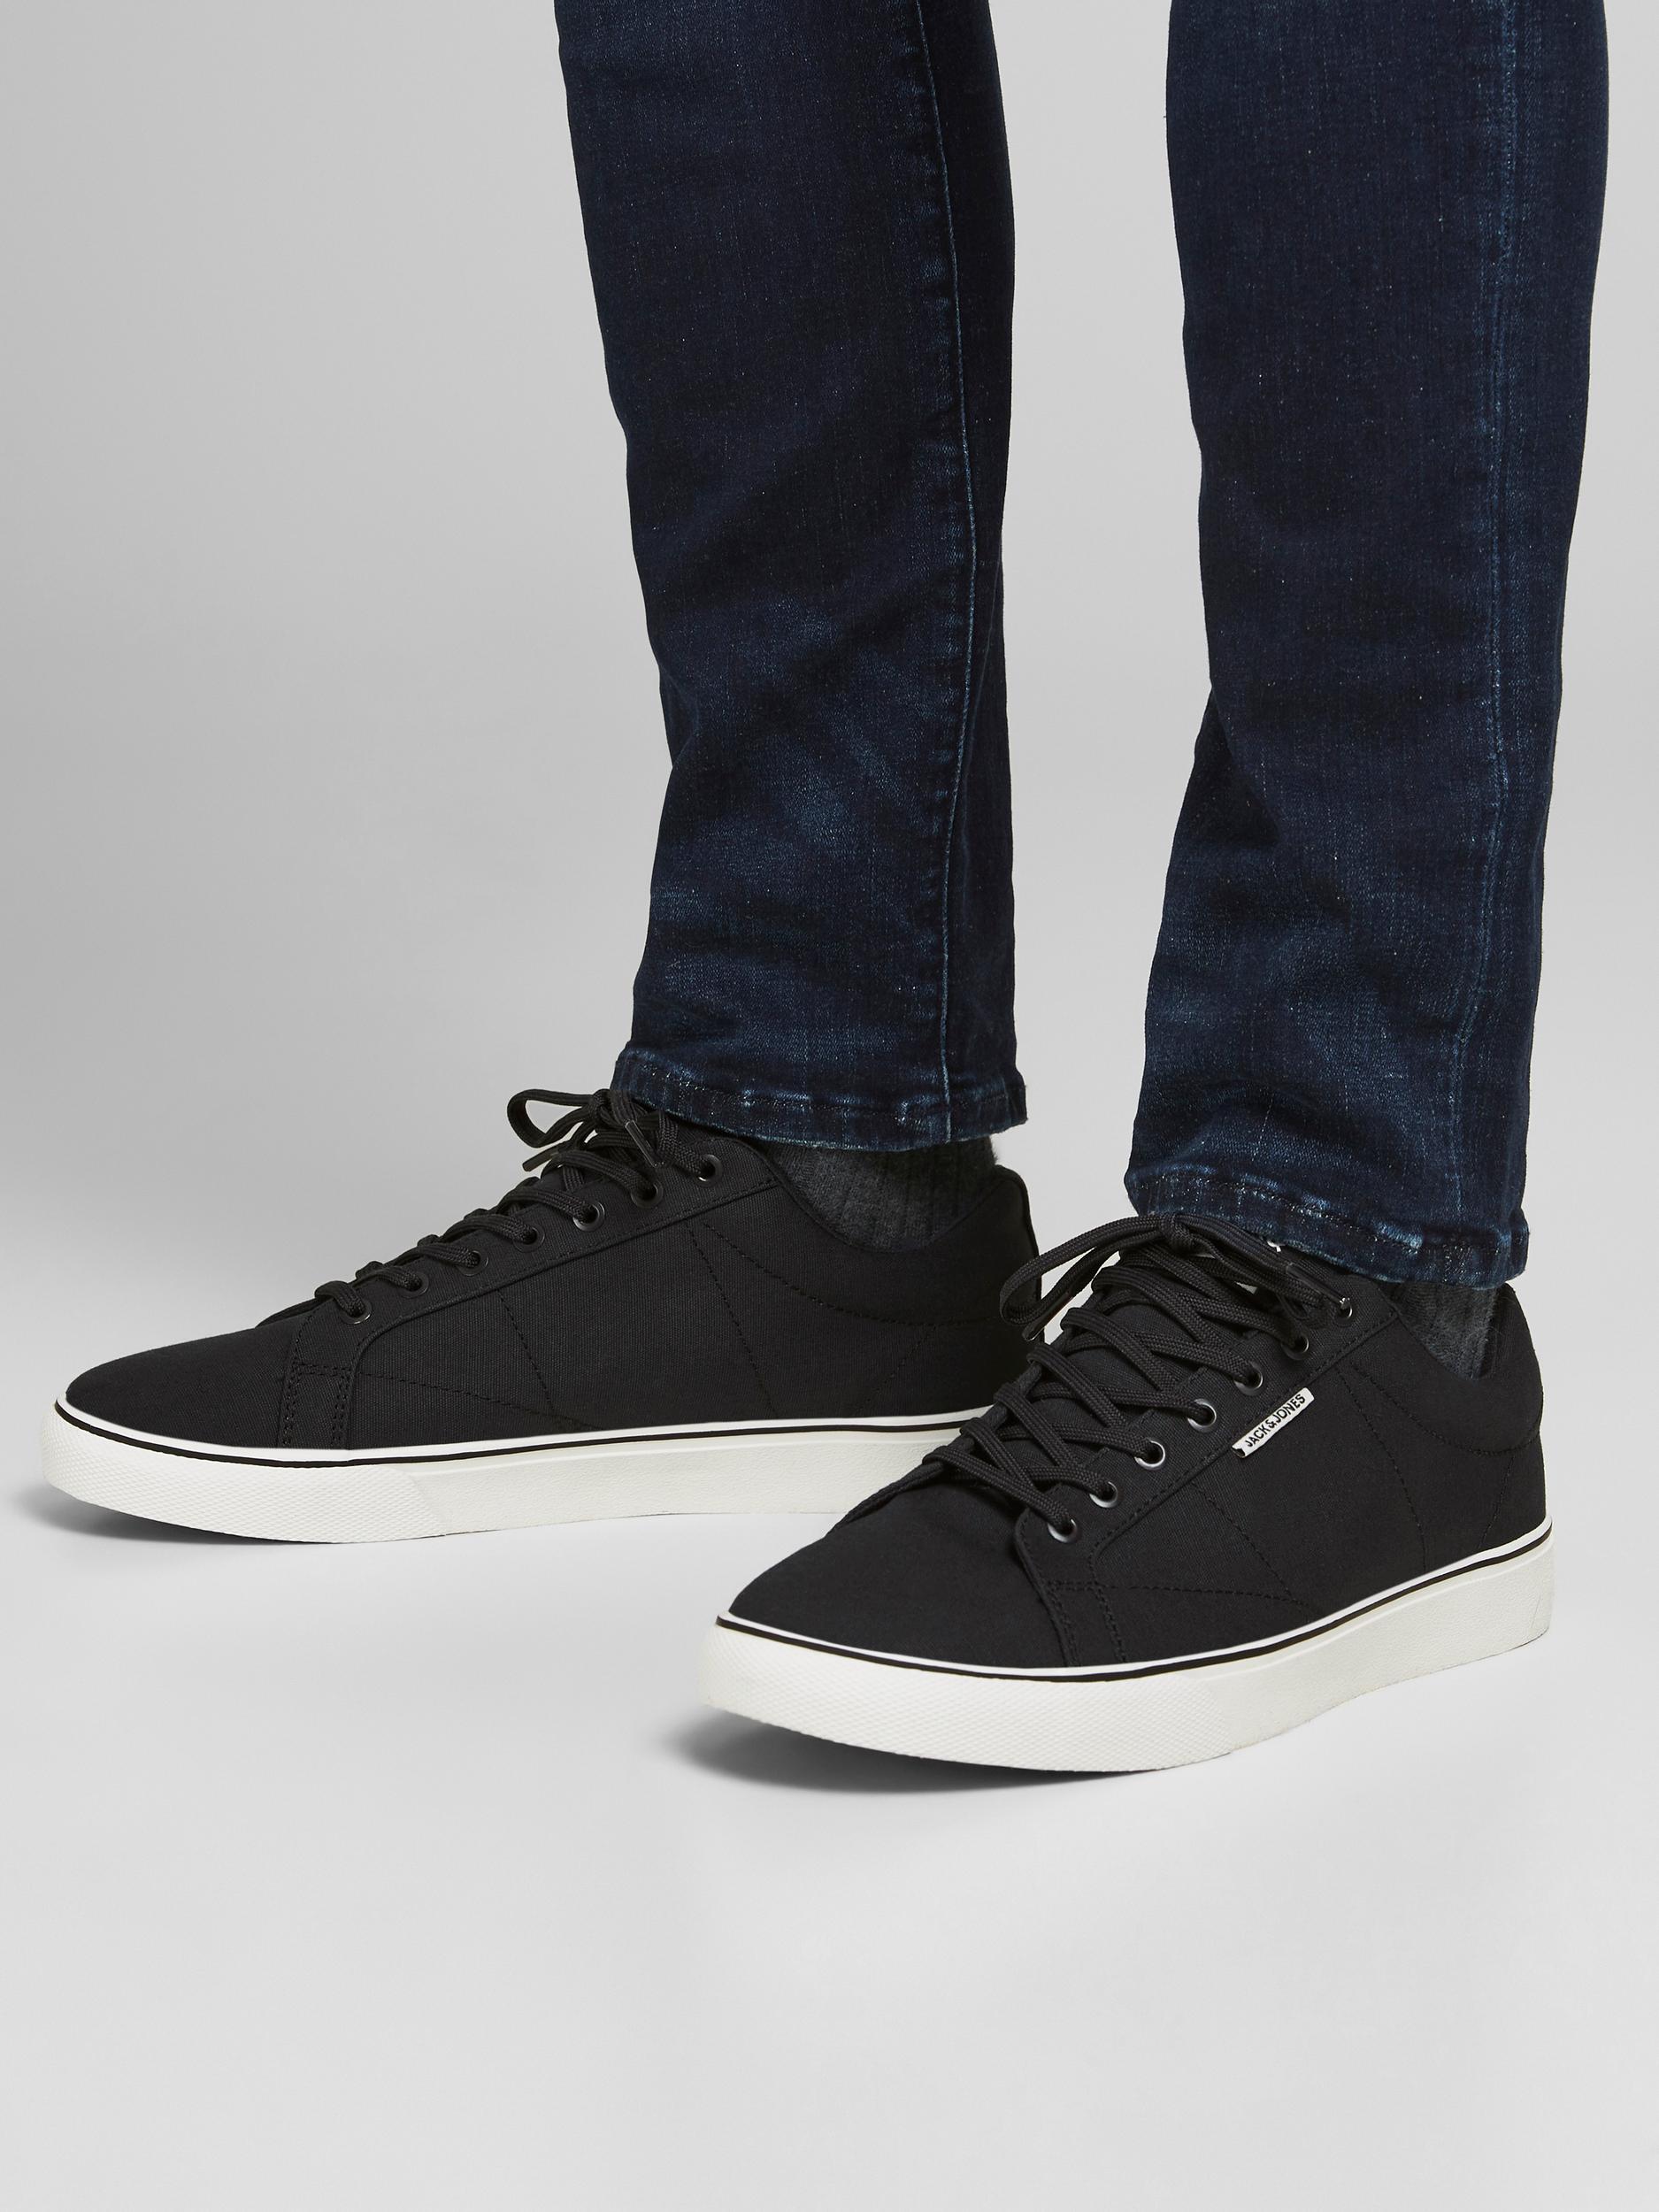 Jack & Jones Carter Canvas sneakers, anthracite, 46